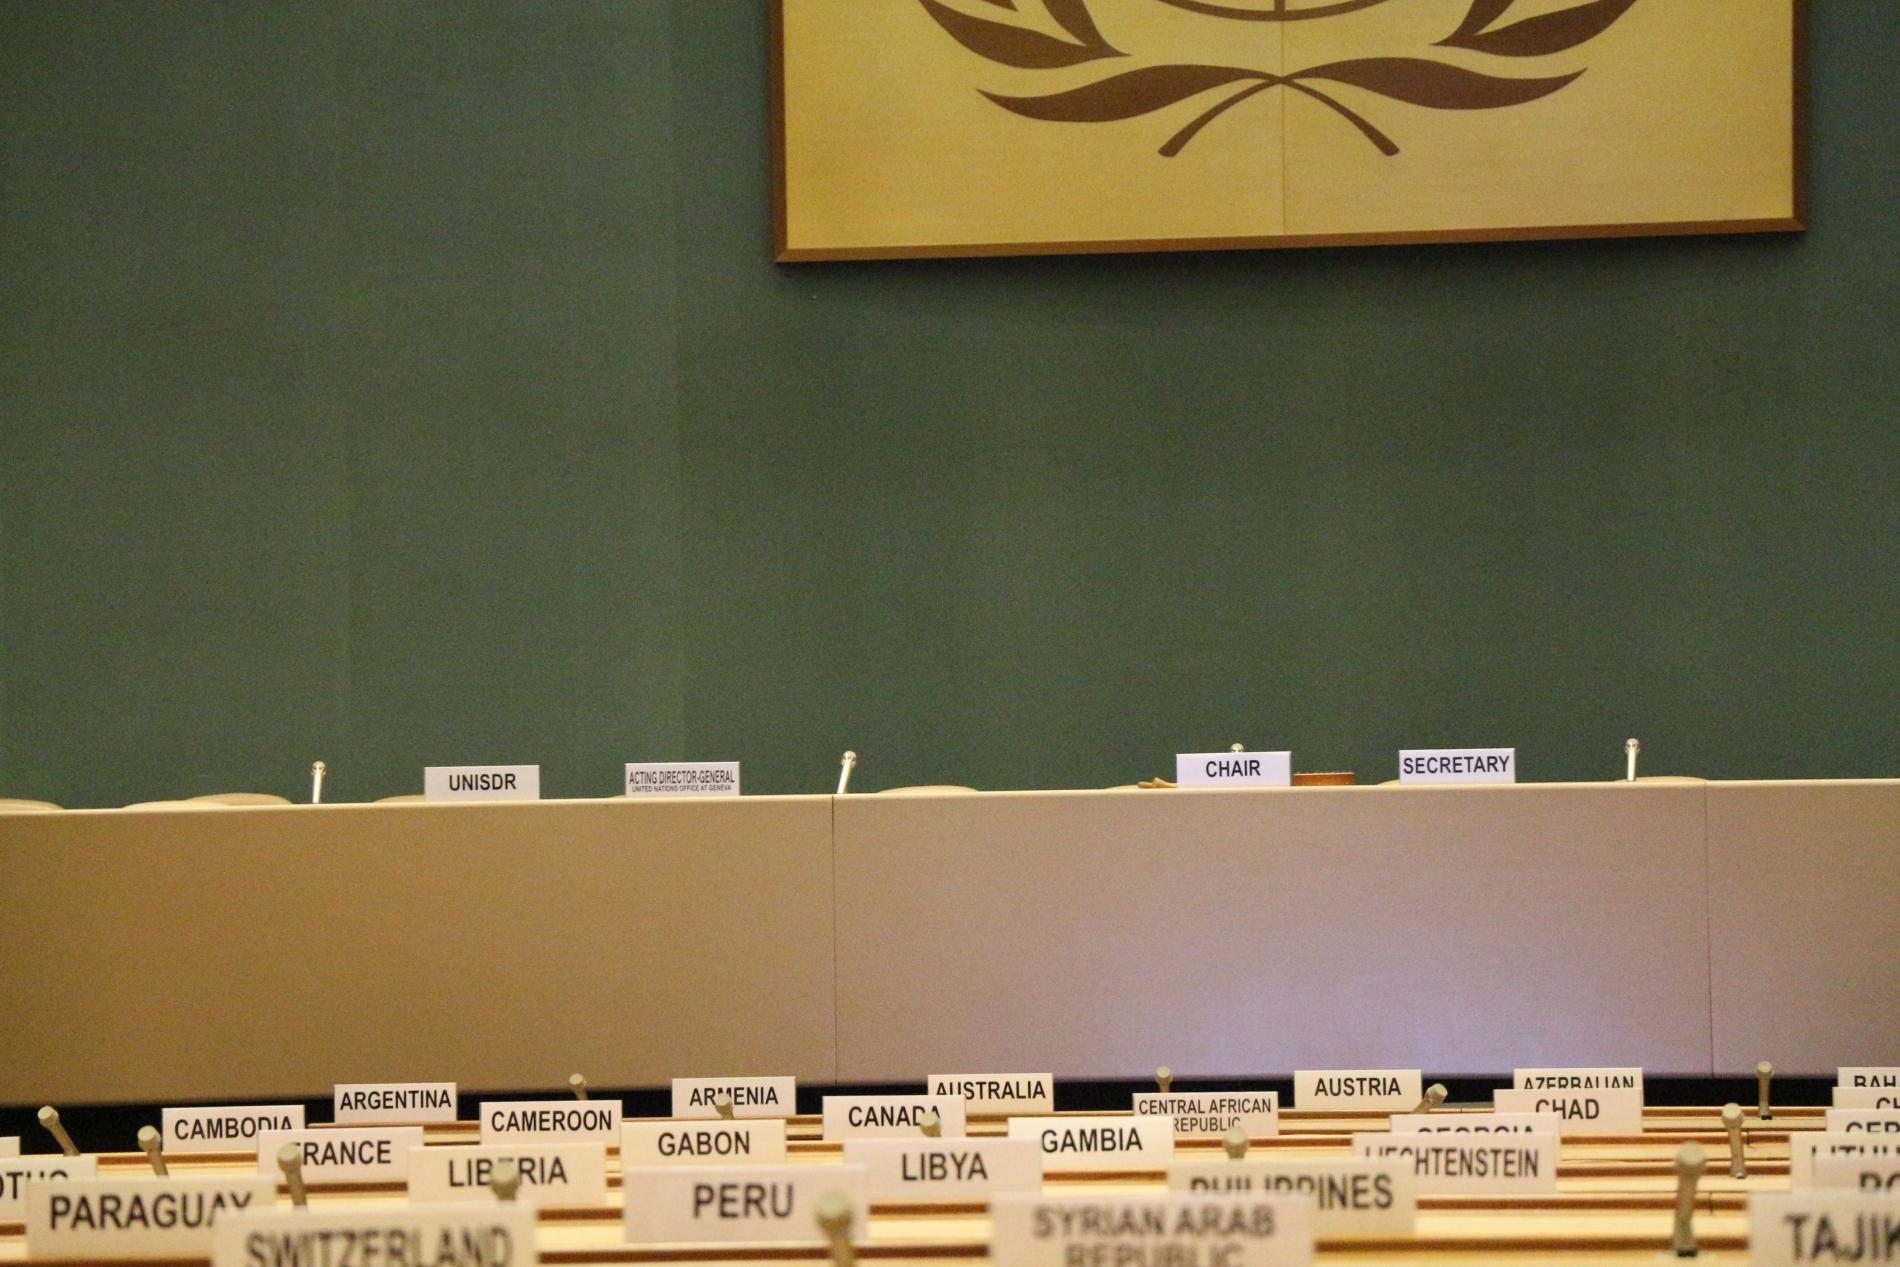 UN meeting room. Photo by Davi Mendes on Unsplash